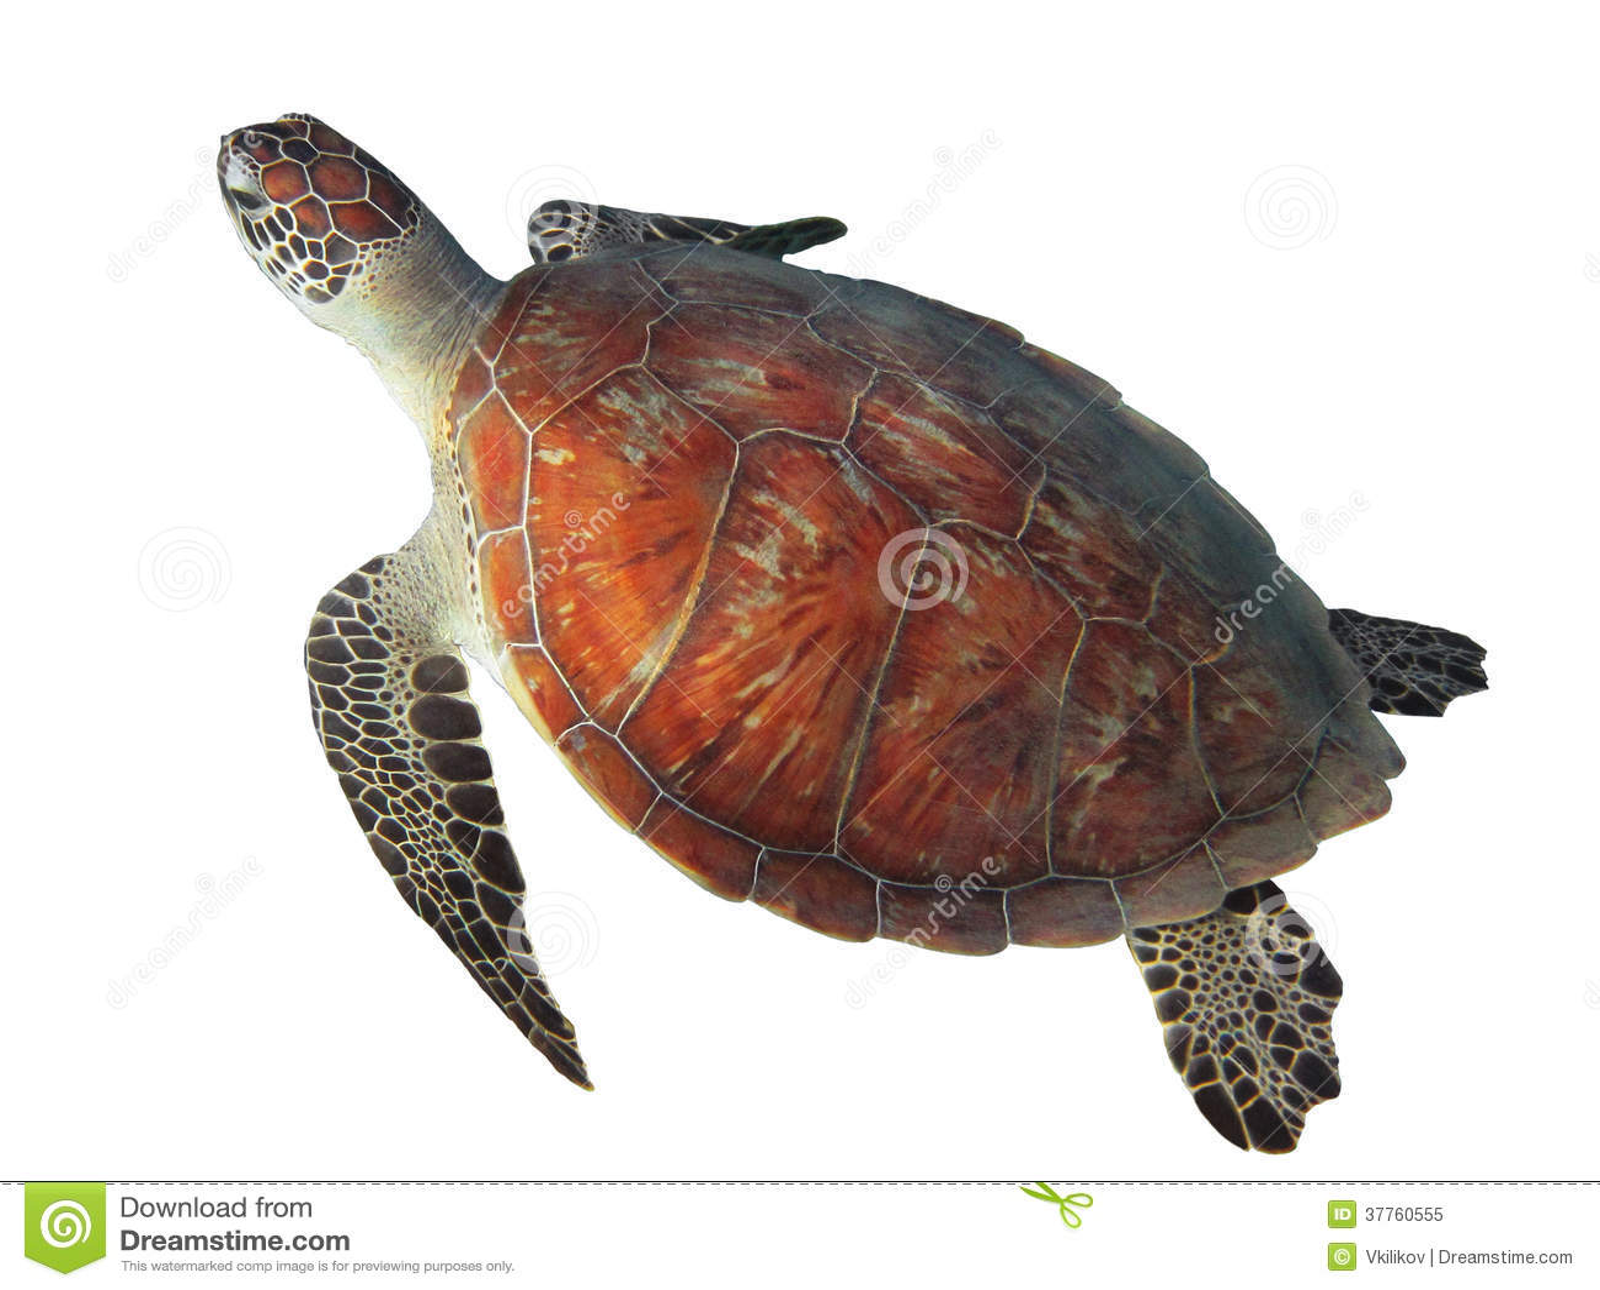 turtle white background - photo #2